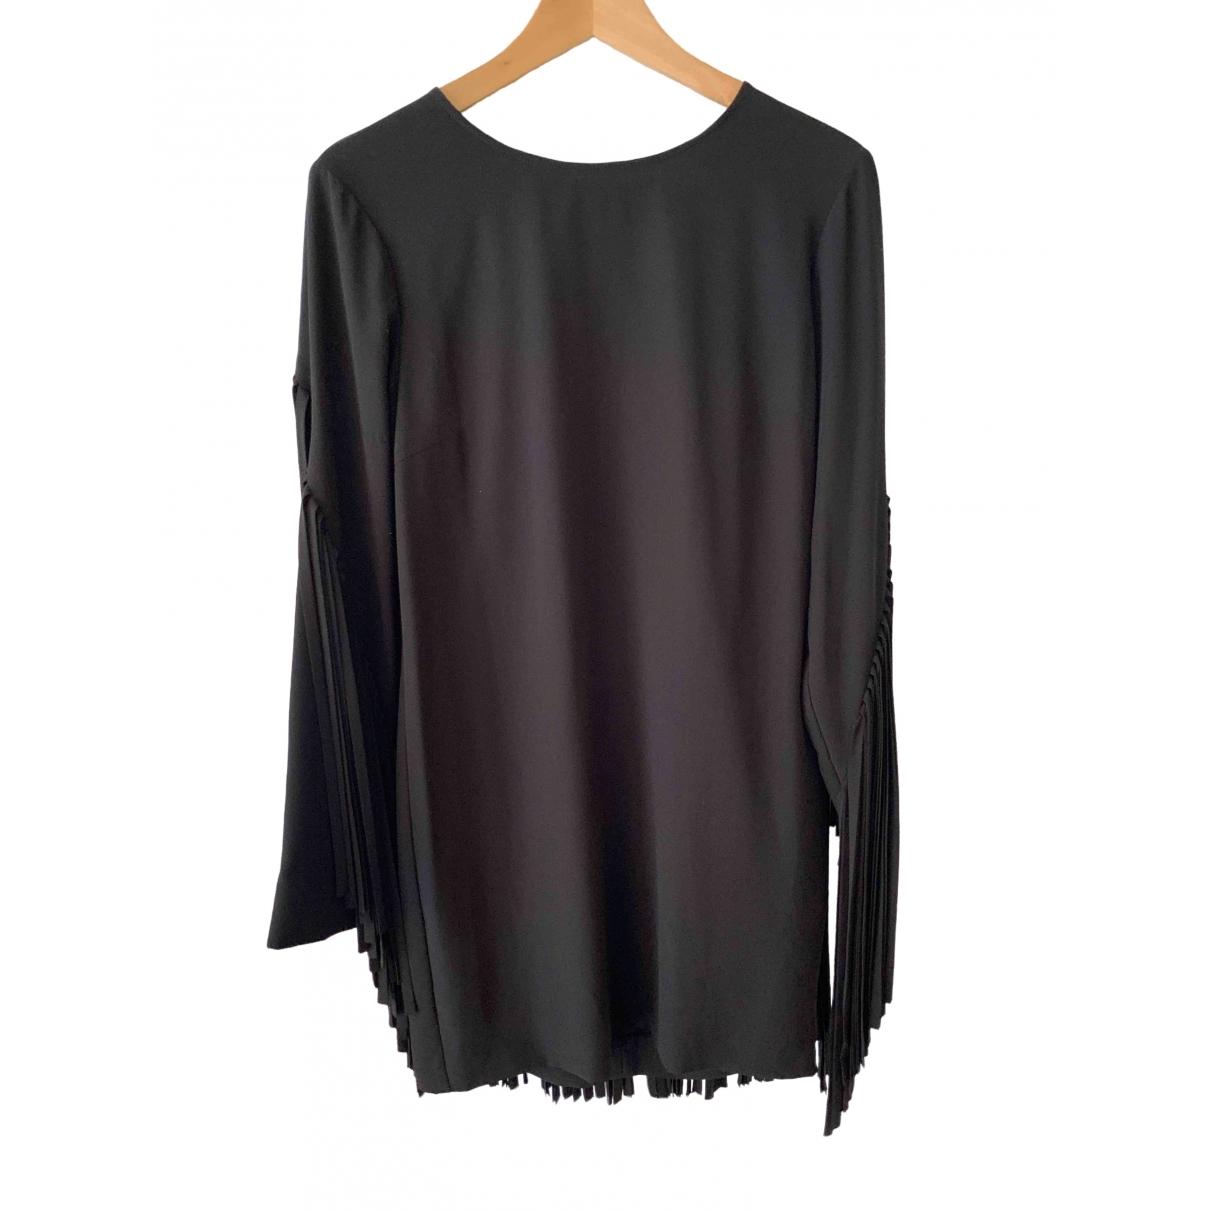 Dkny \N Kleid in  Schwarz Polyester